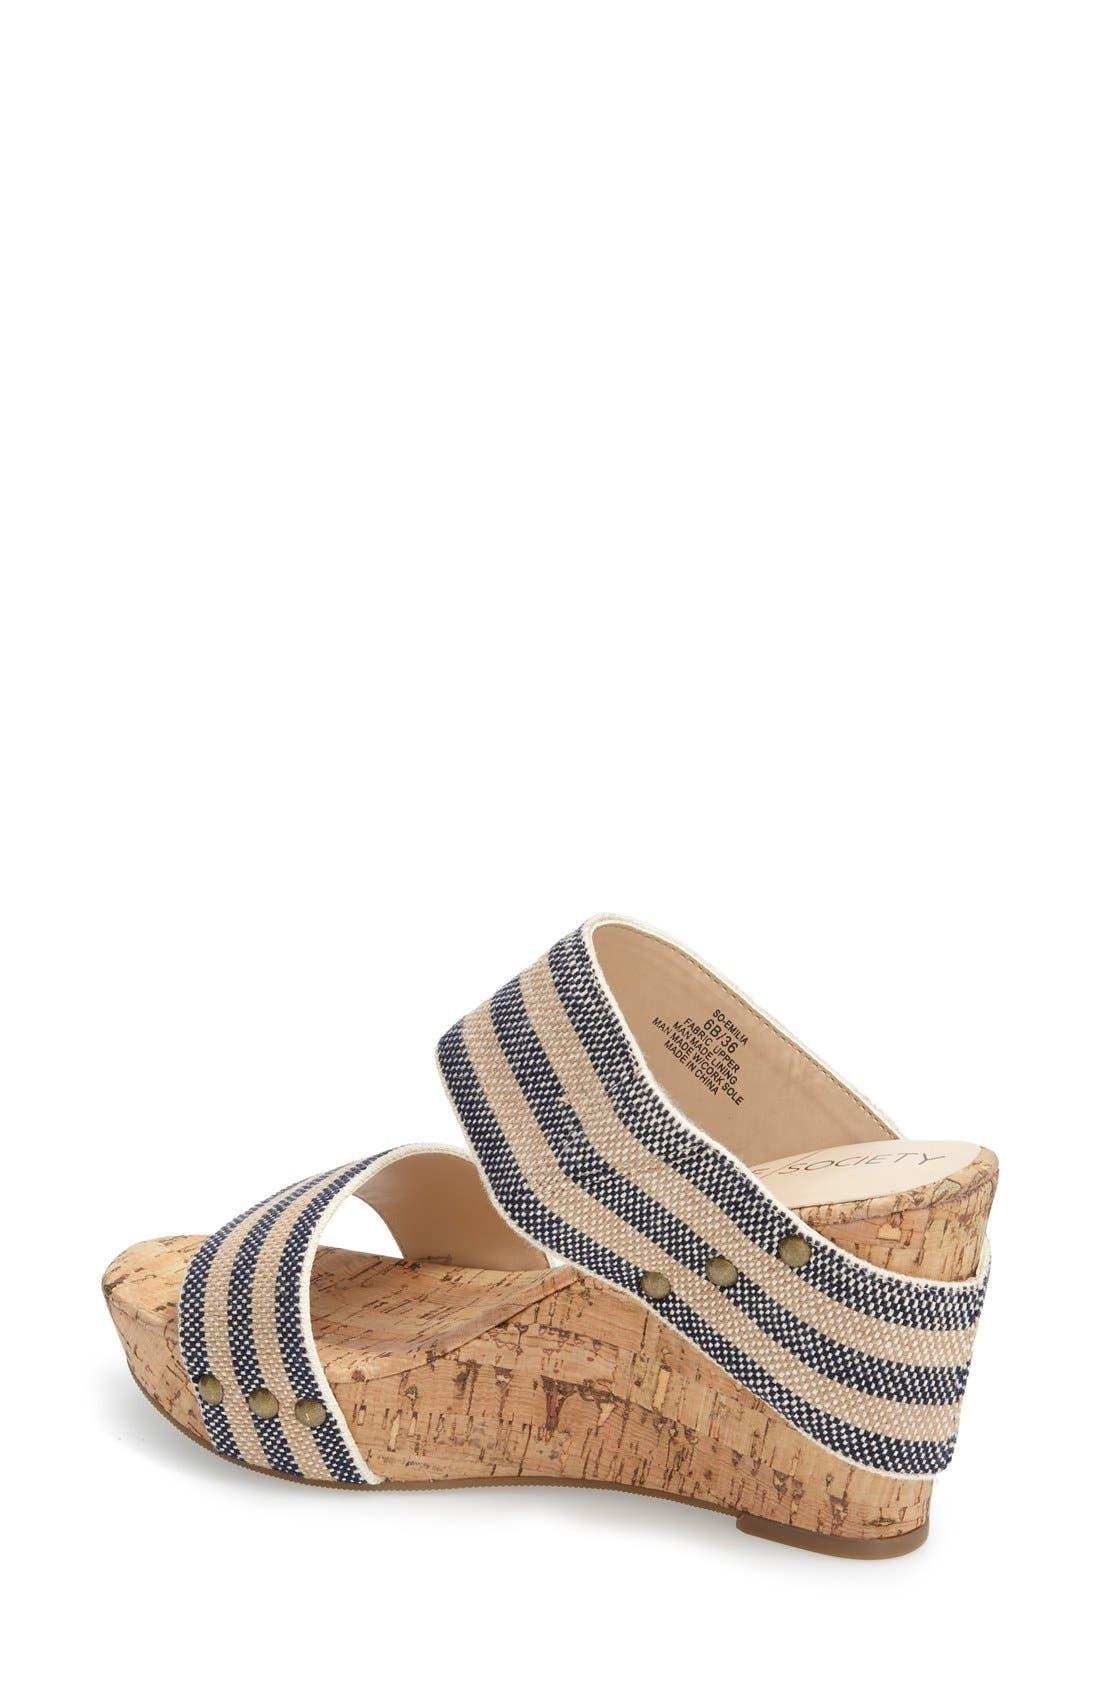 'Emilia 2' Wedge Sandal,                             Alternate thumbnail 5, color,